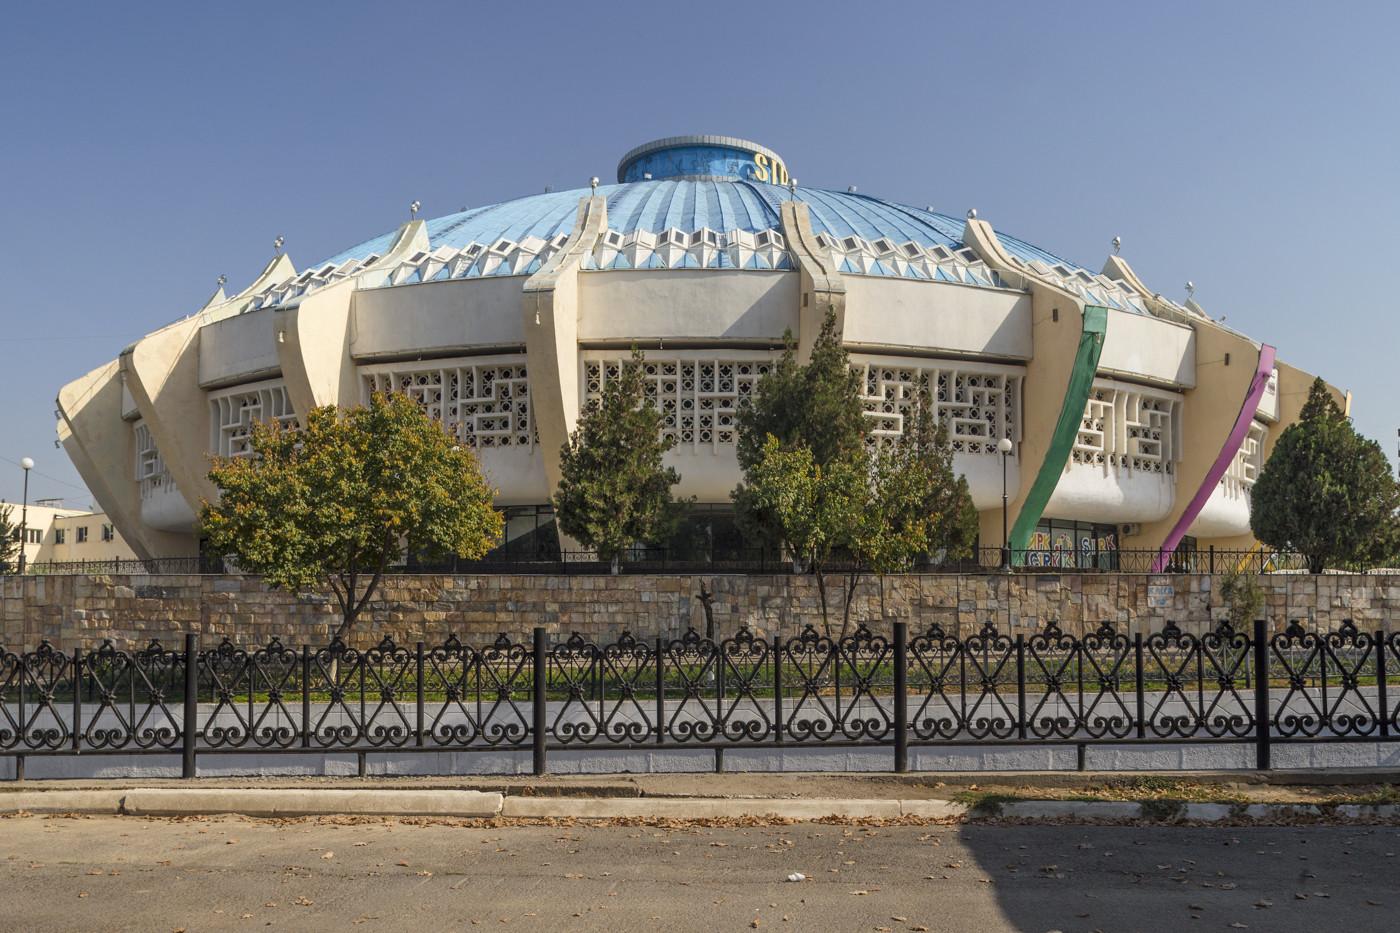 Circo (1976). Tashkent, Uzbekistan